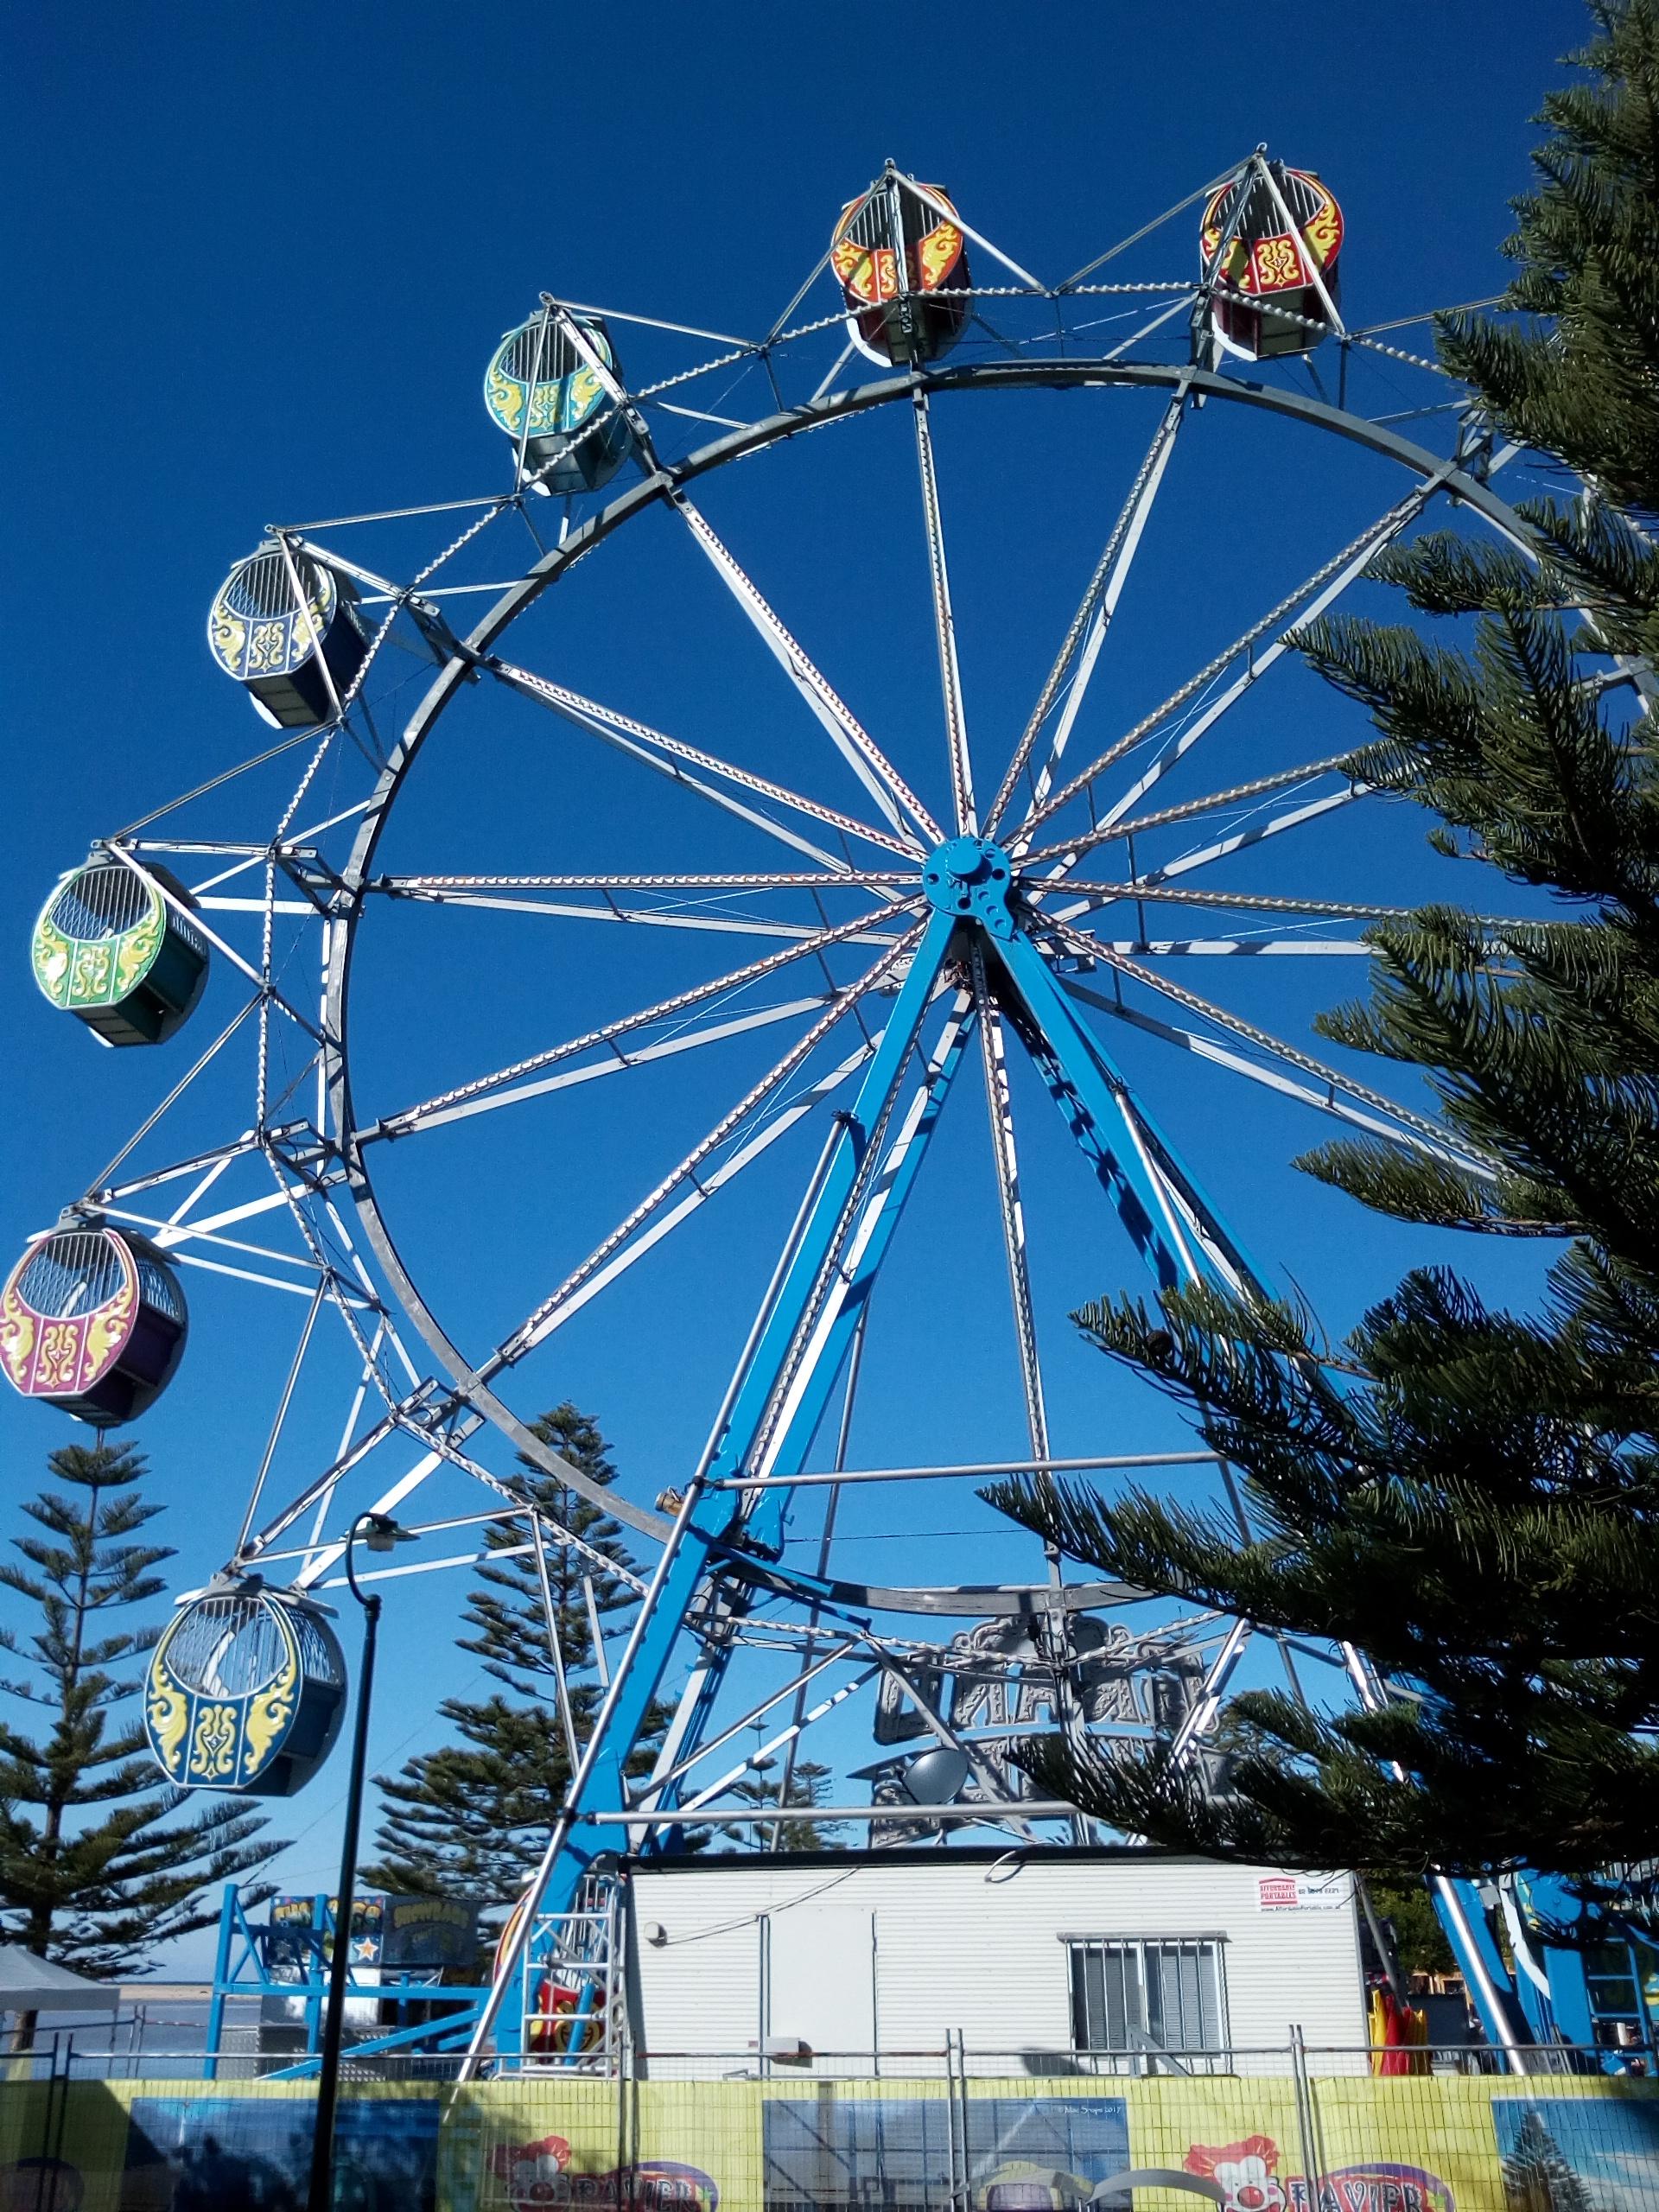 A ferris wheel, a vertical carousel, at The Entrance